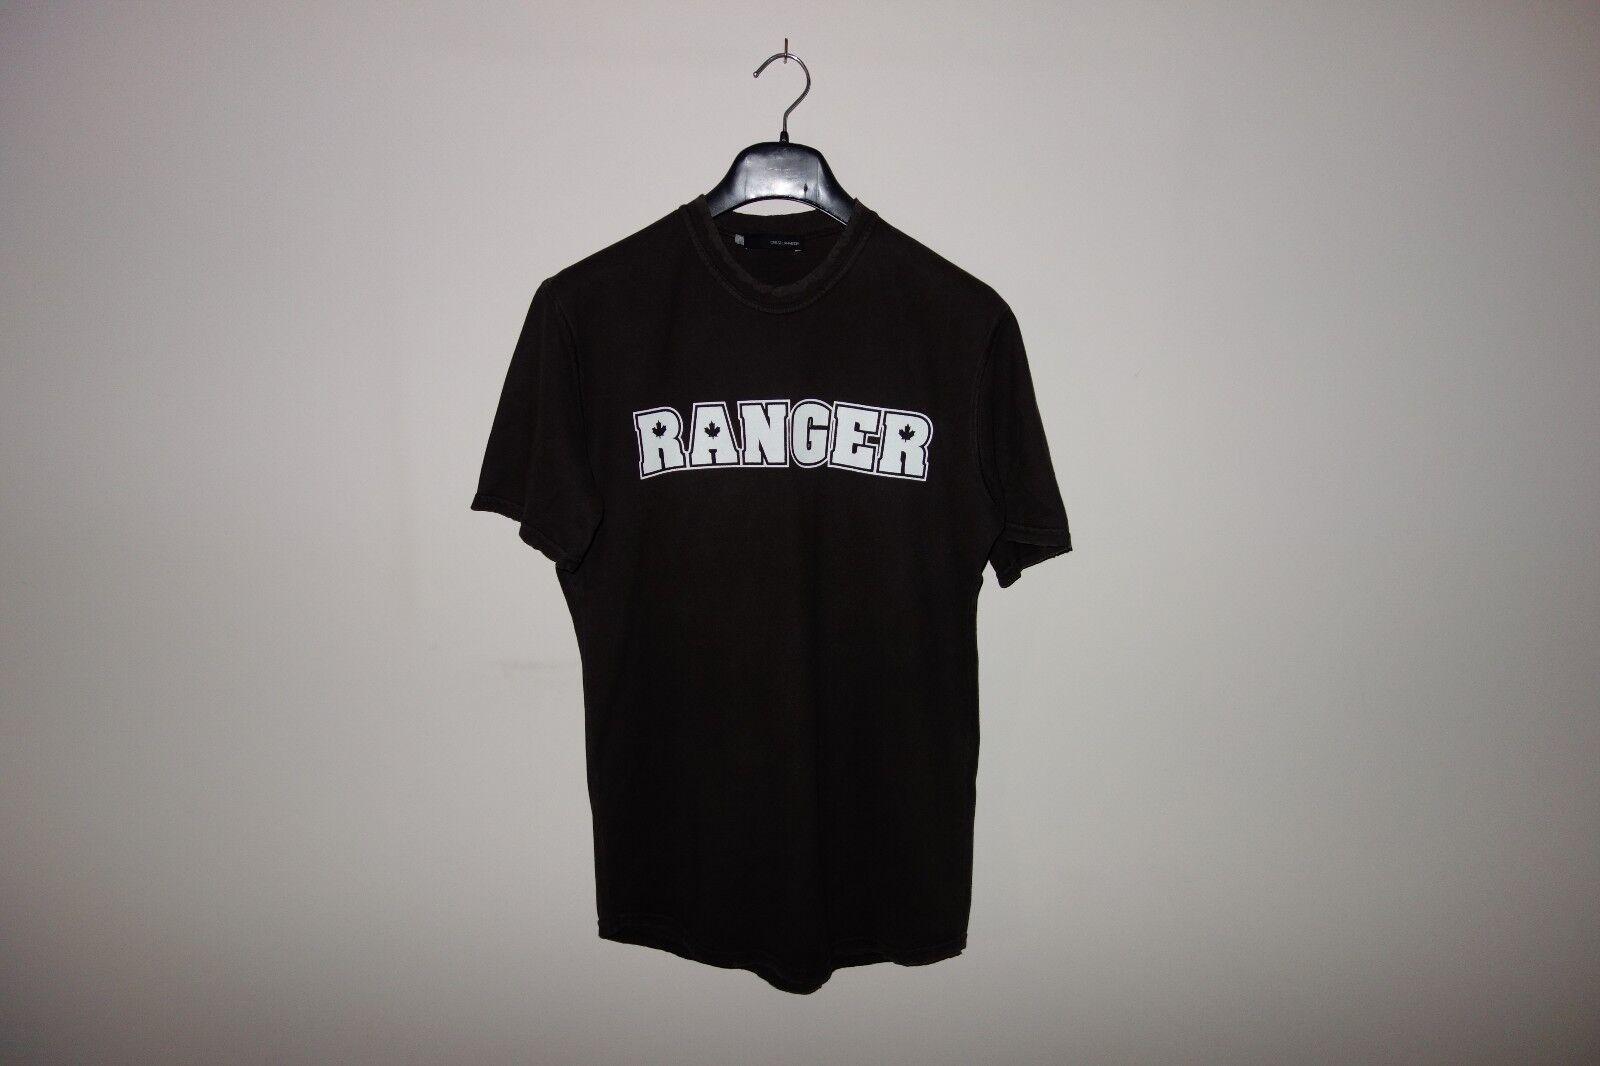 DsquaROT² Runway RANGER T-shirt L FW/04-05 71XM288 Made in , RARE